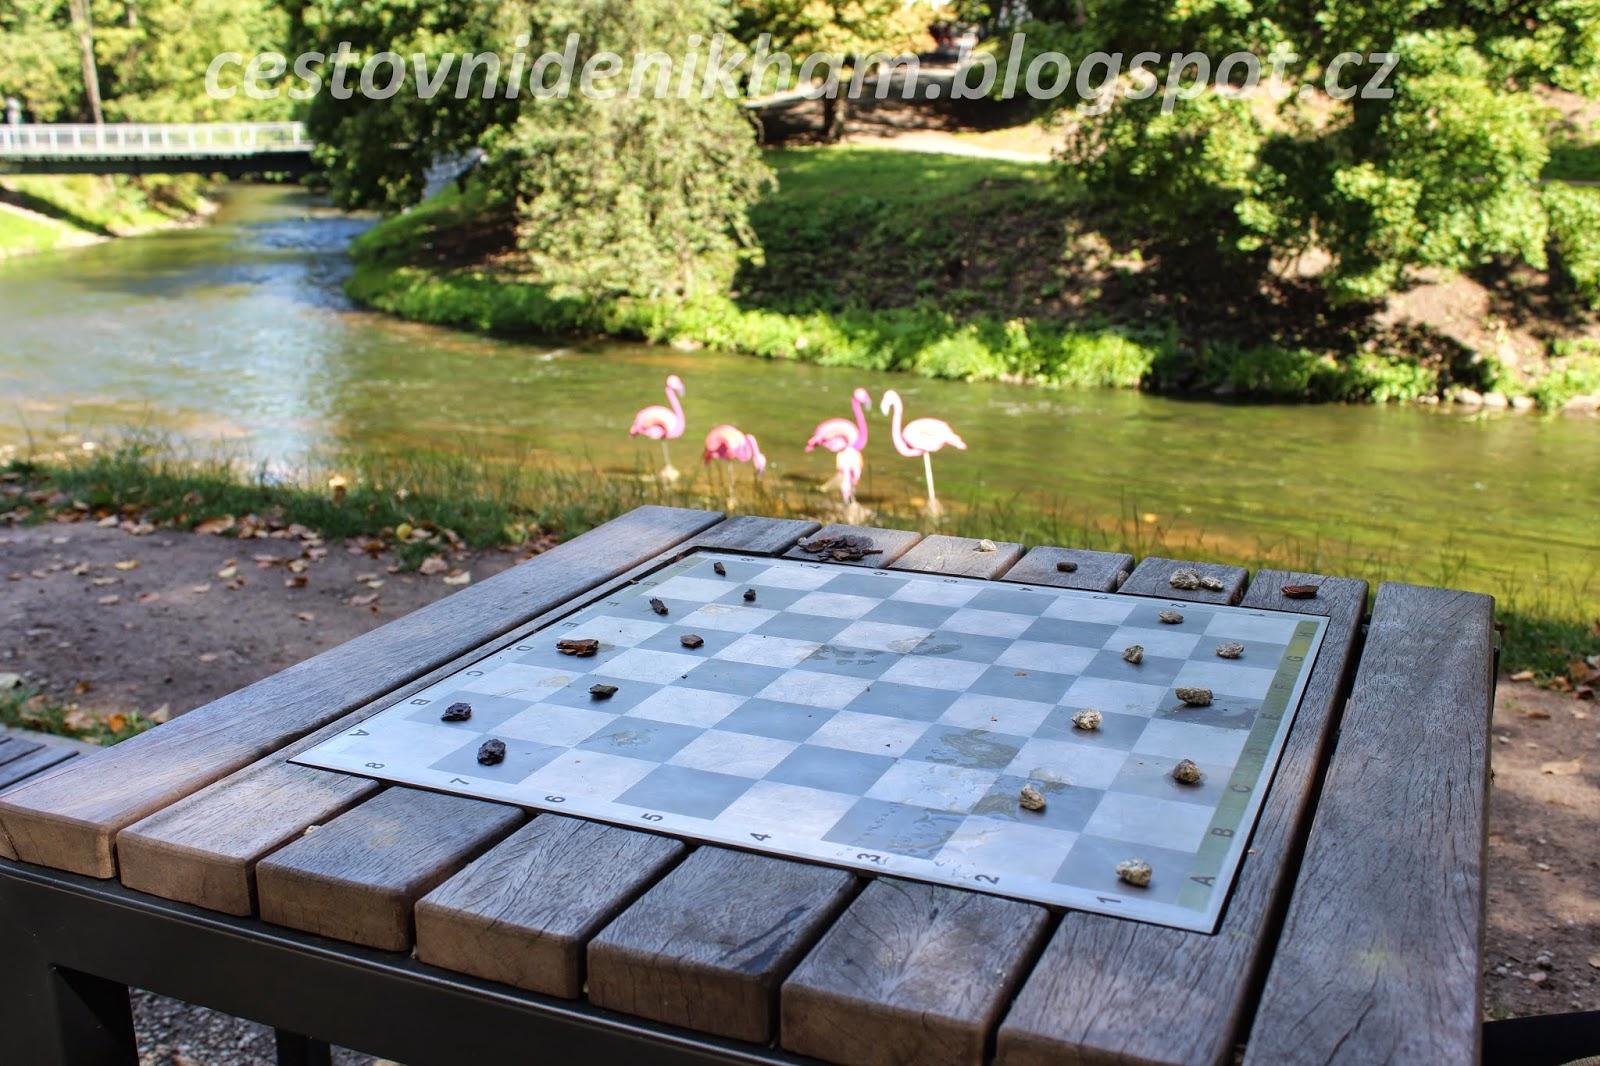 Chessboard in Bernard´s park